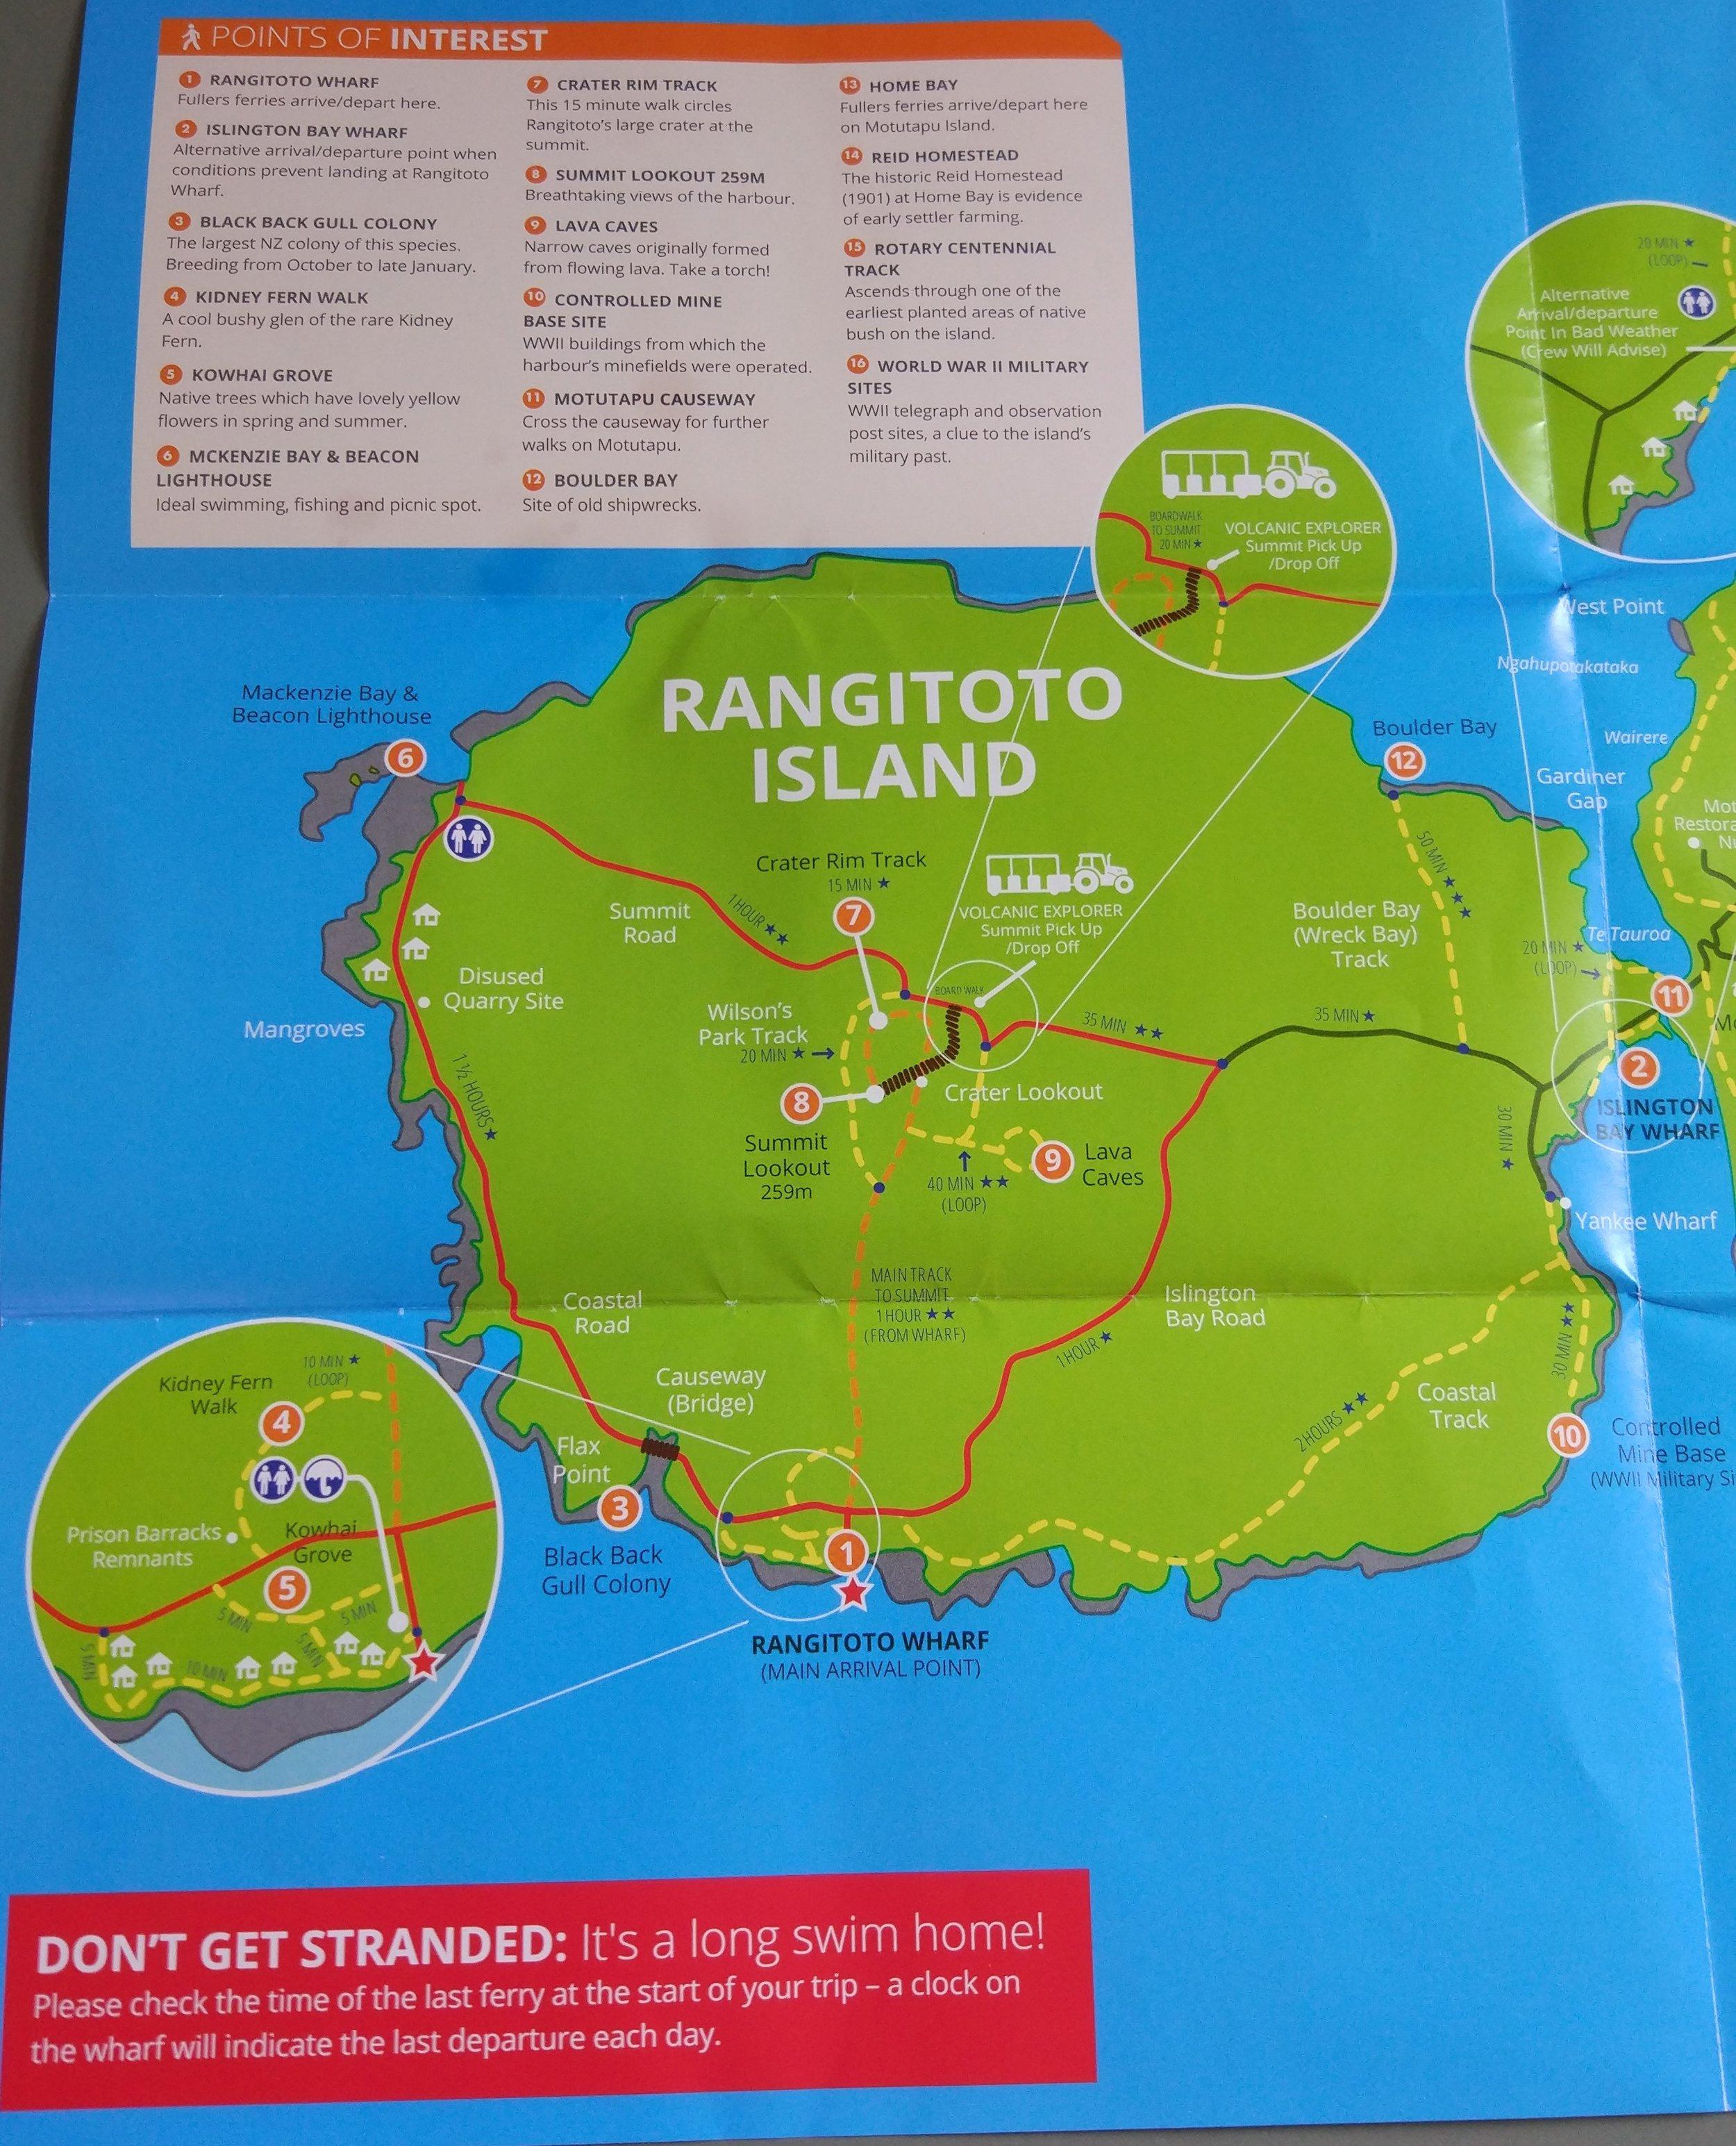 Rangitoto island map with walks